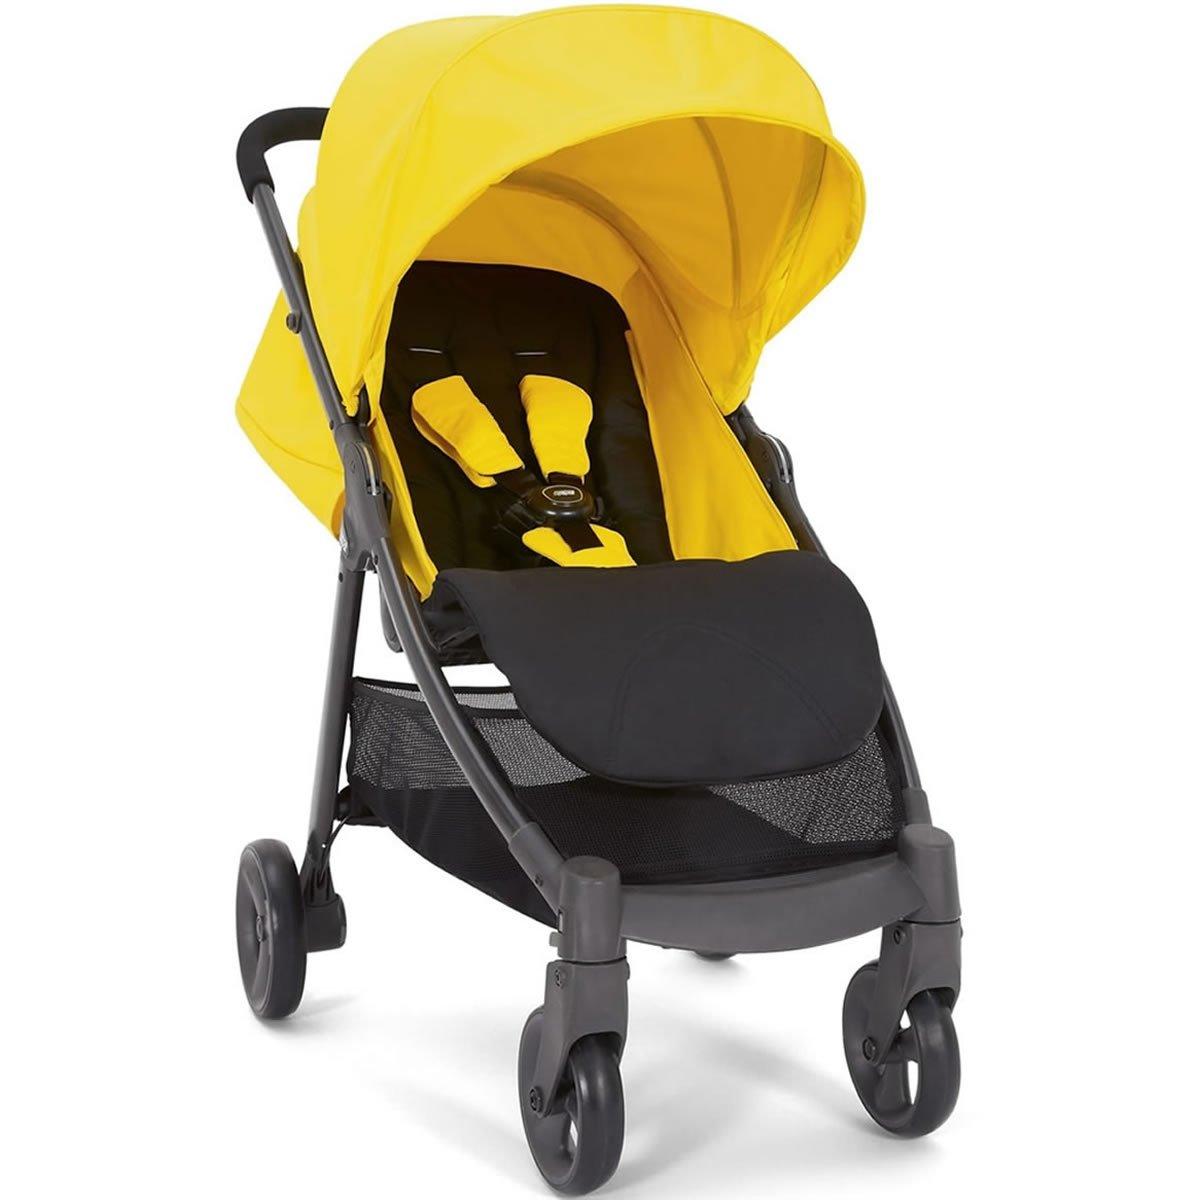 Armadillo Stroller by Mamas & Papas